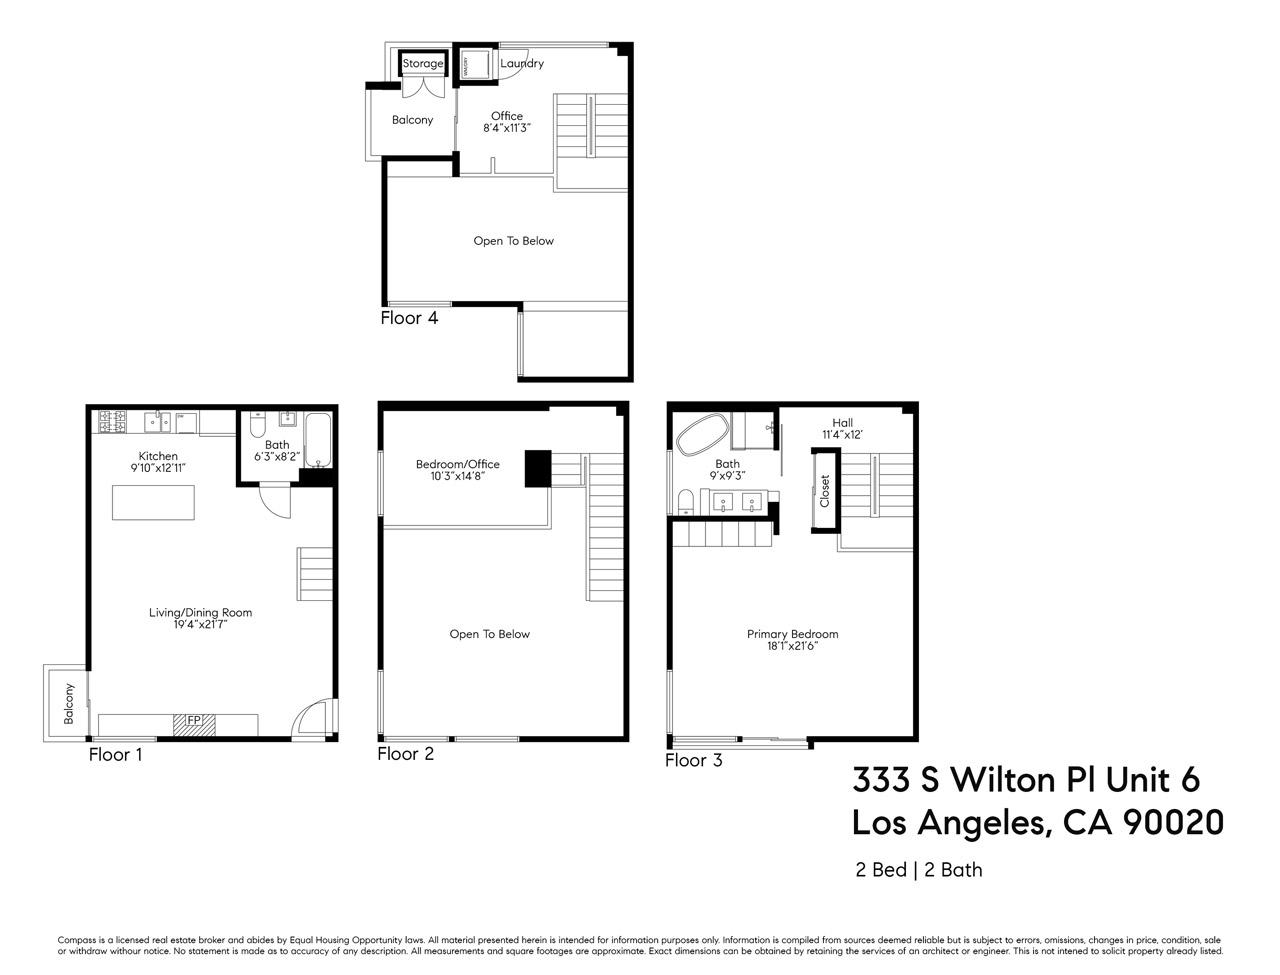 333 S Wilton Pl #1 Los Angeles, CA 90020 Hancock Park Loft for Sale Tracy Do Compass Real Estate